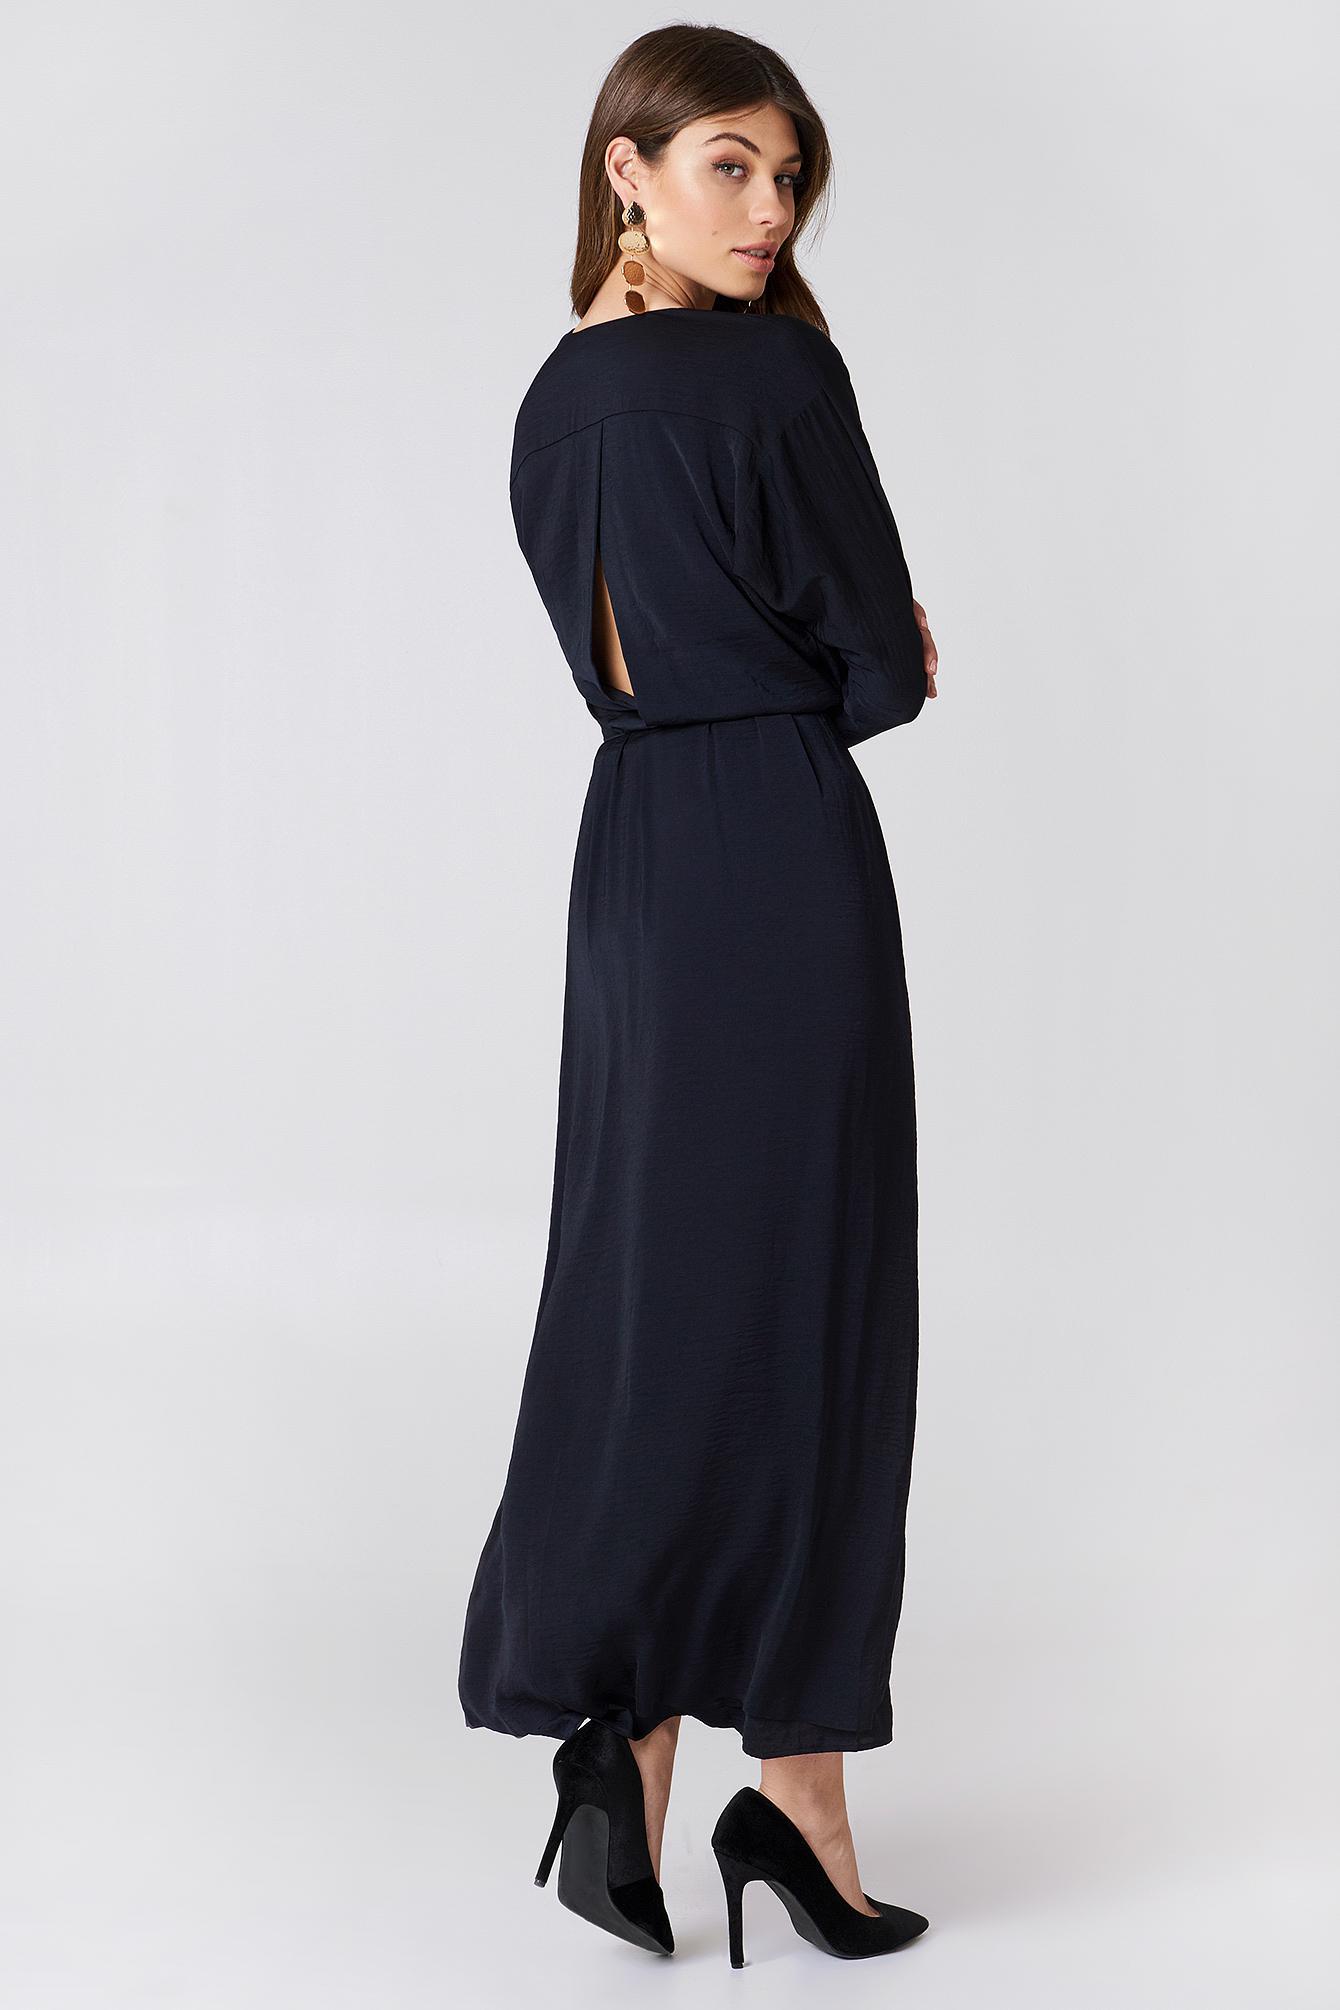 Lyst - Filippa K Drapey Wrap Dress in Blue 82dbc4419f65